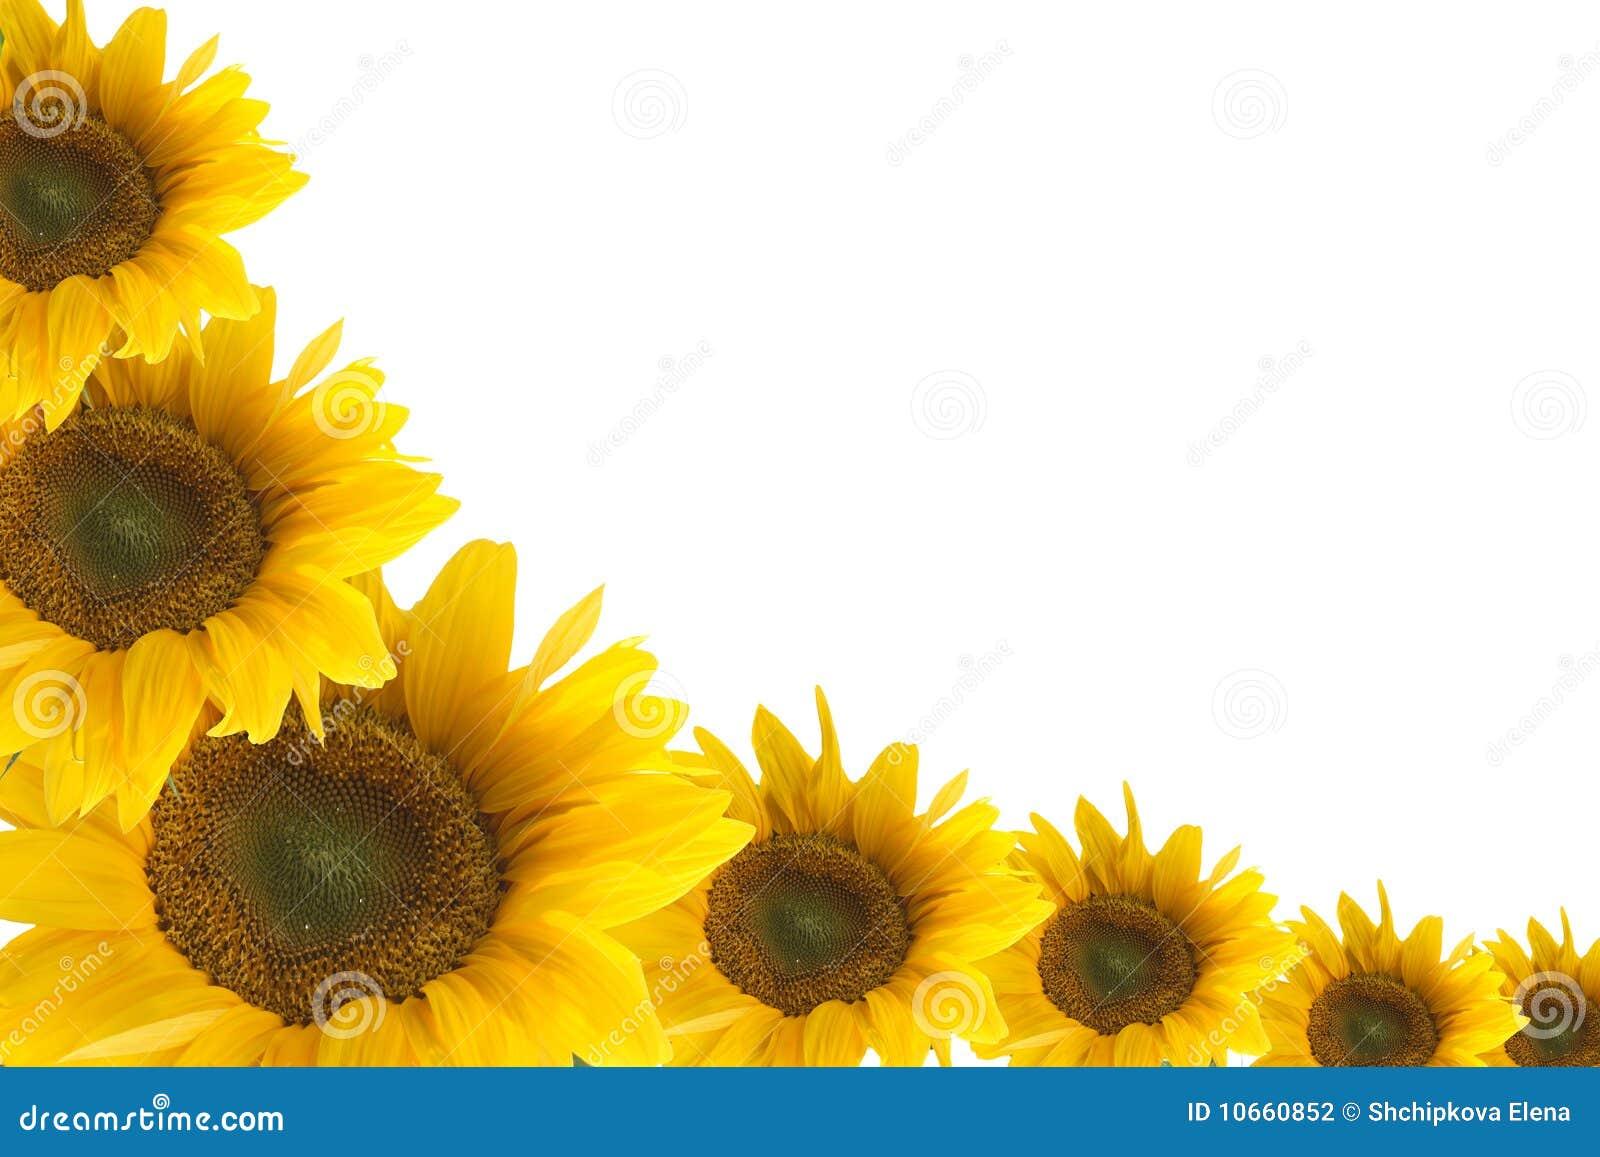 Nett Sonnenblumenbilderrahmen Bilder - Rahmen Ideen ...